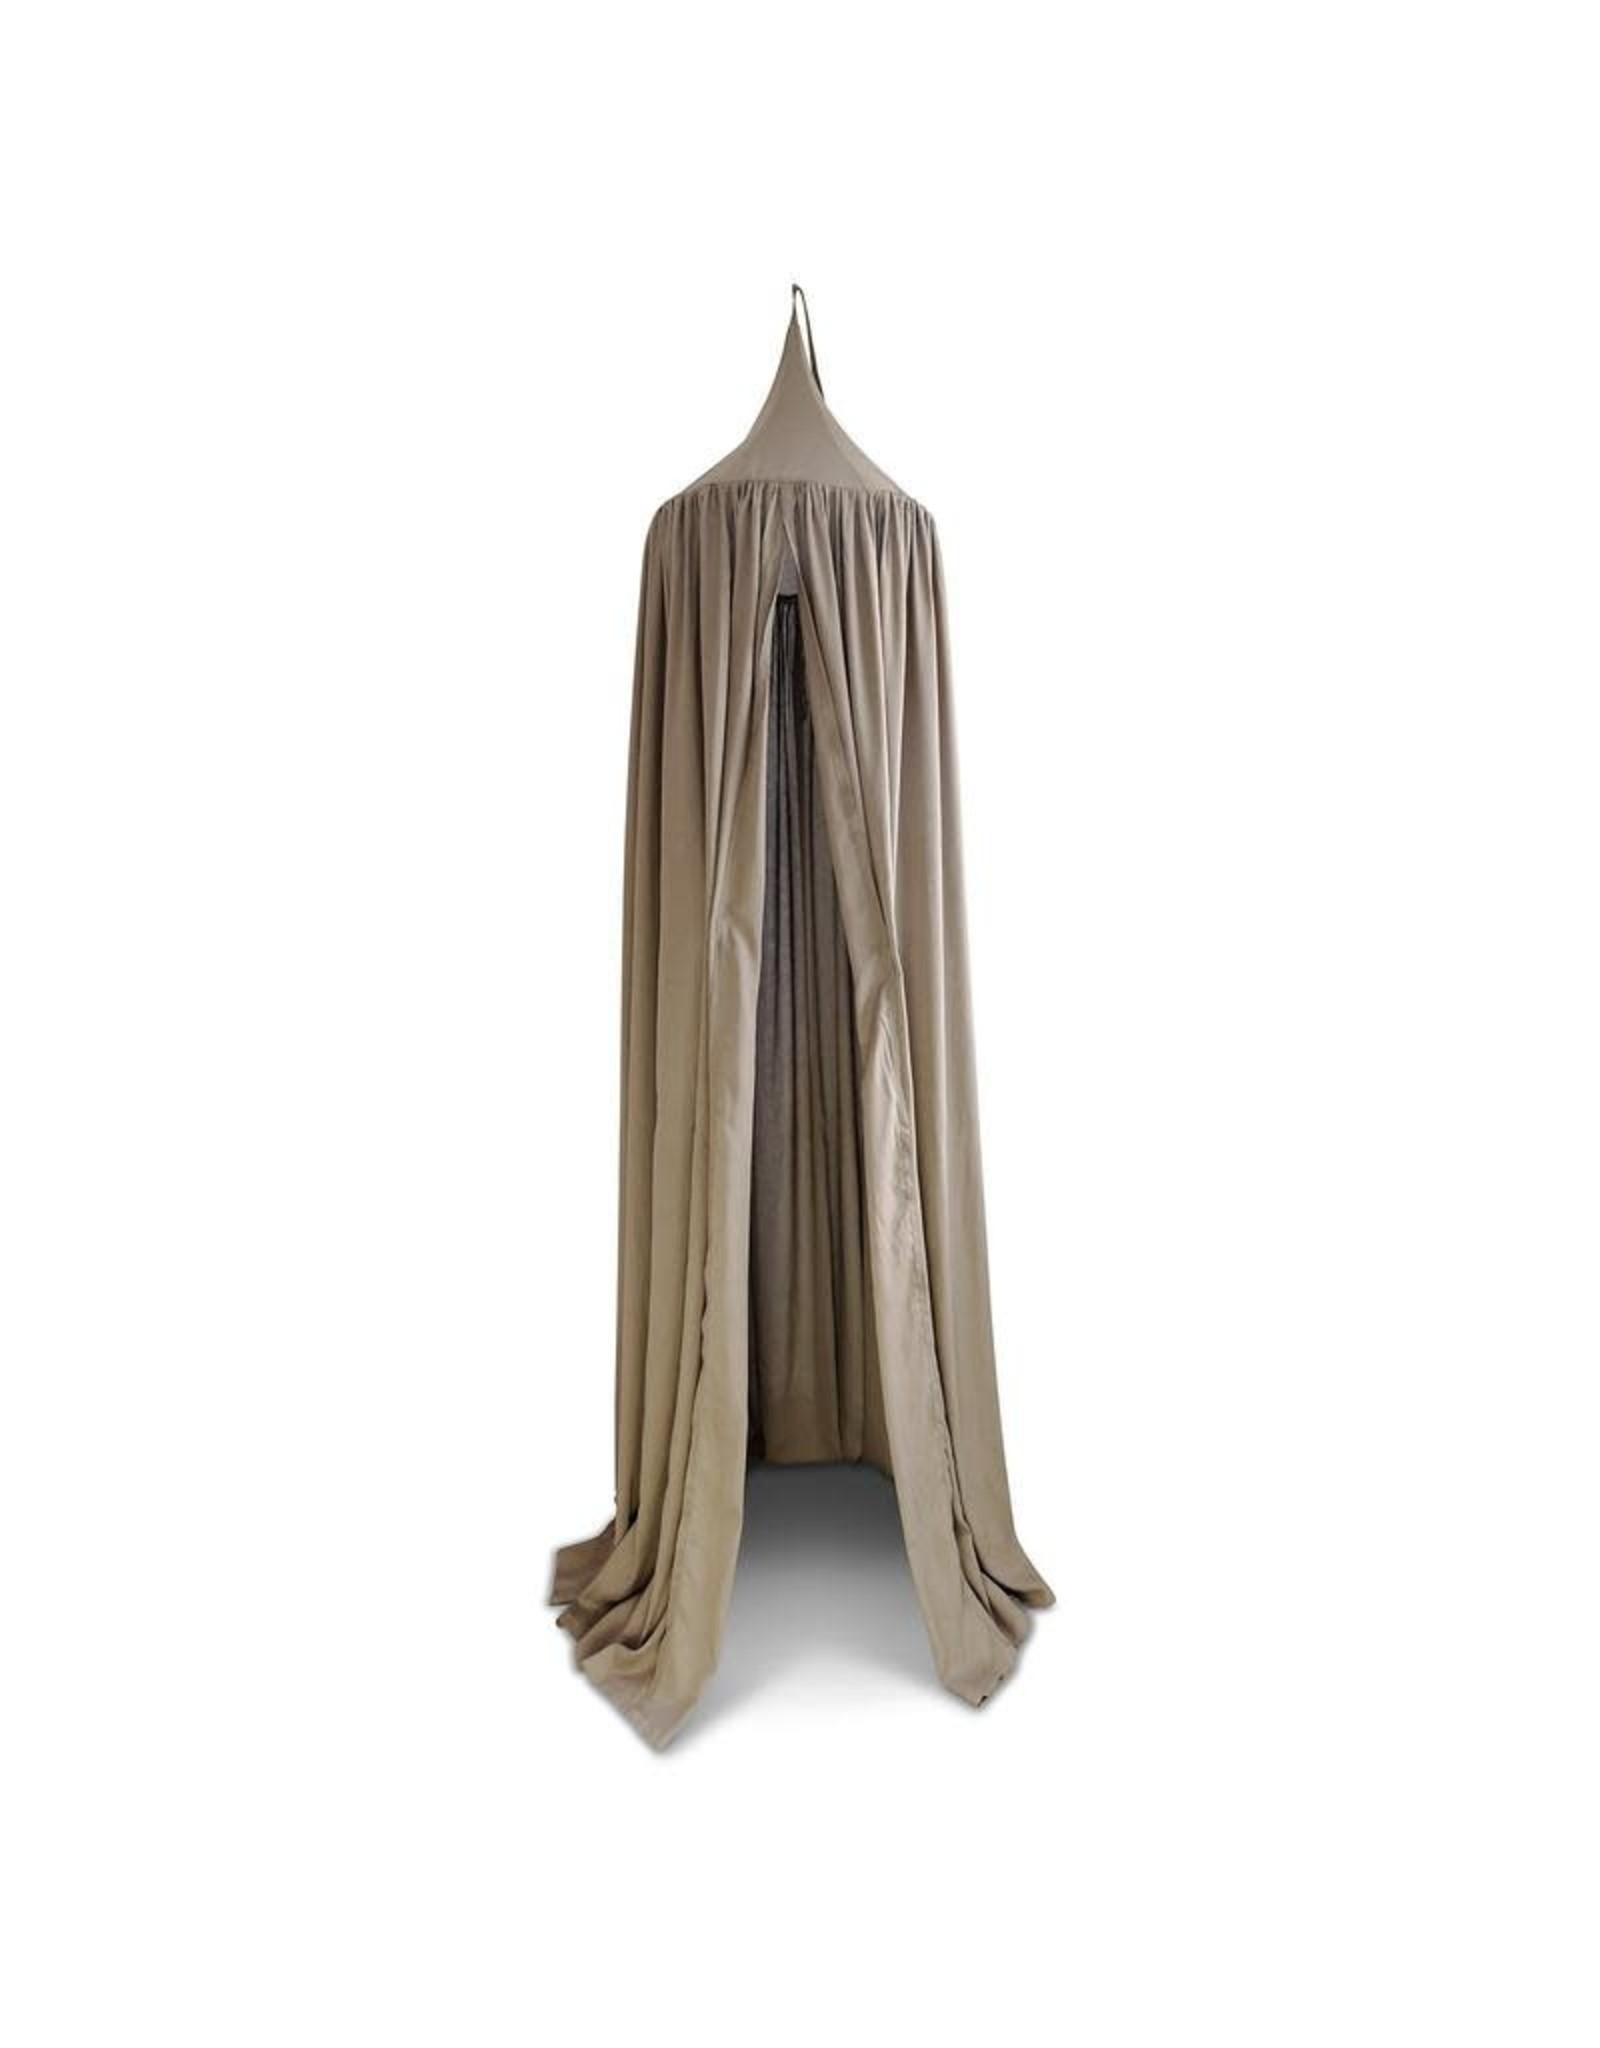 O.B. Designs Linen Canopy - Safari Green